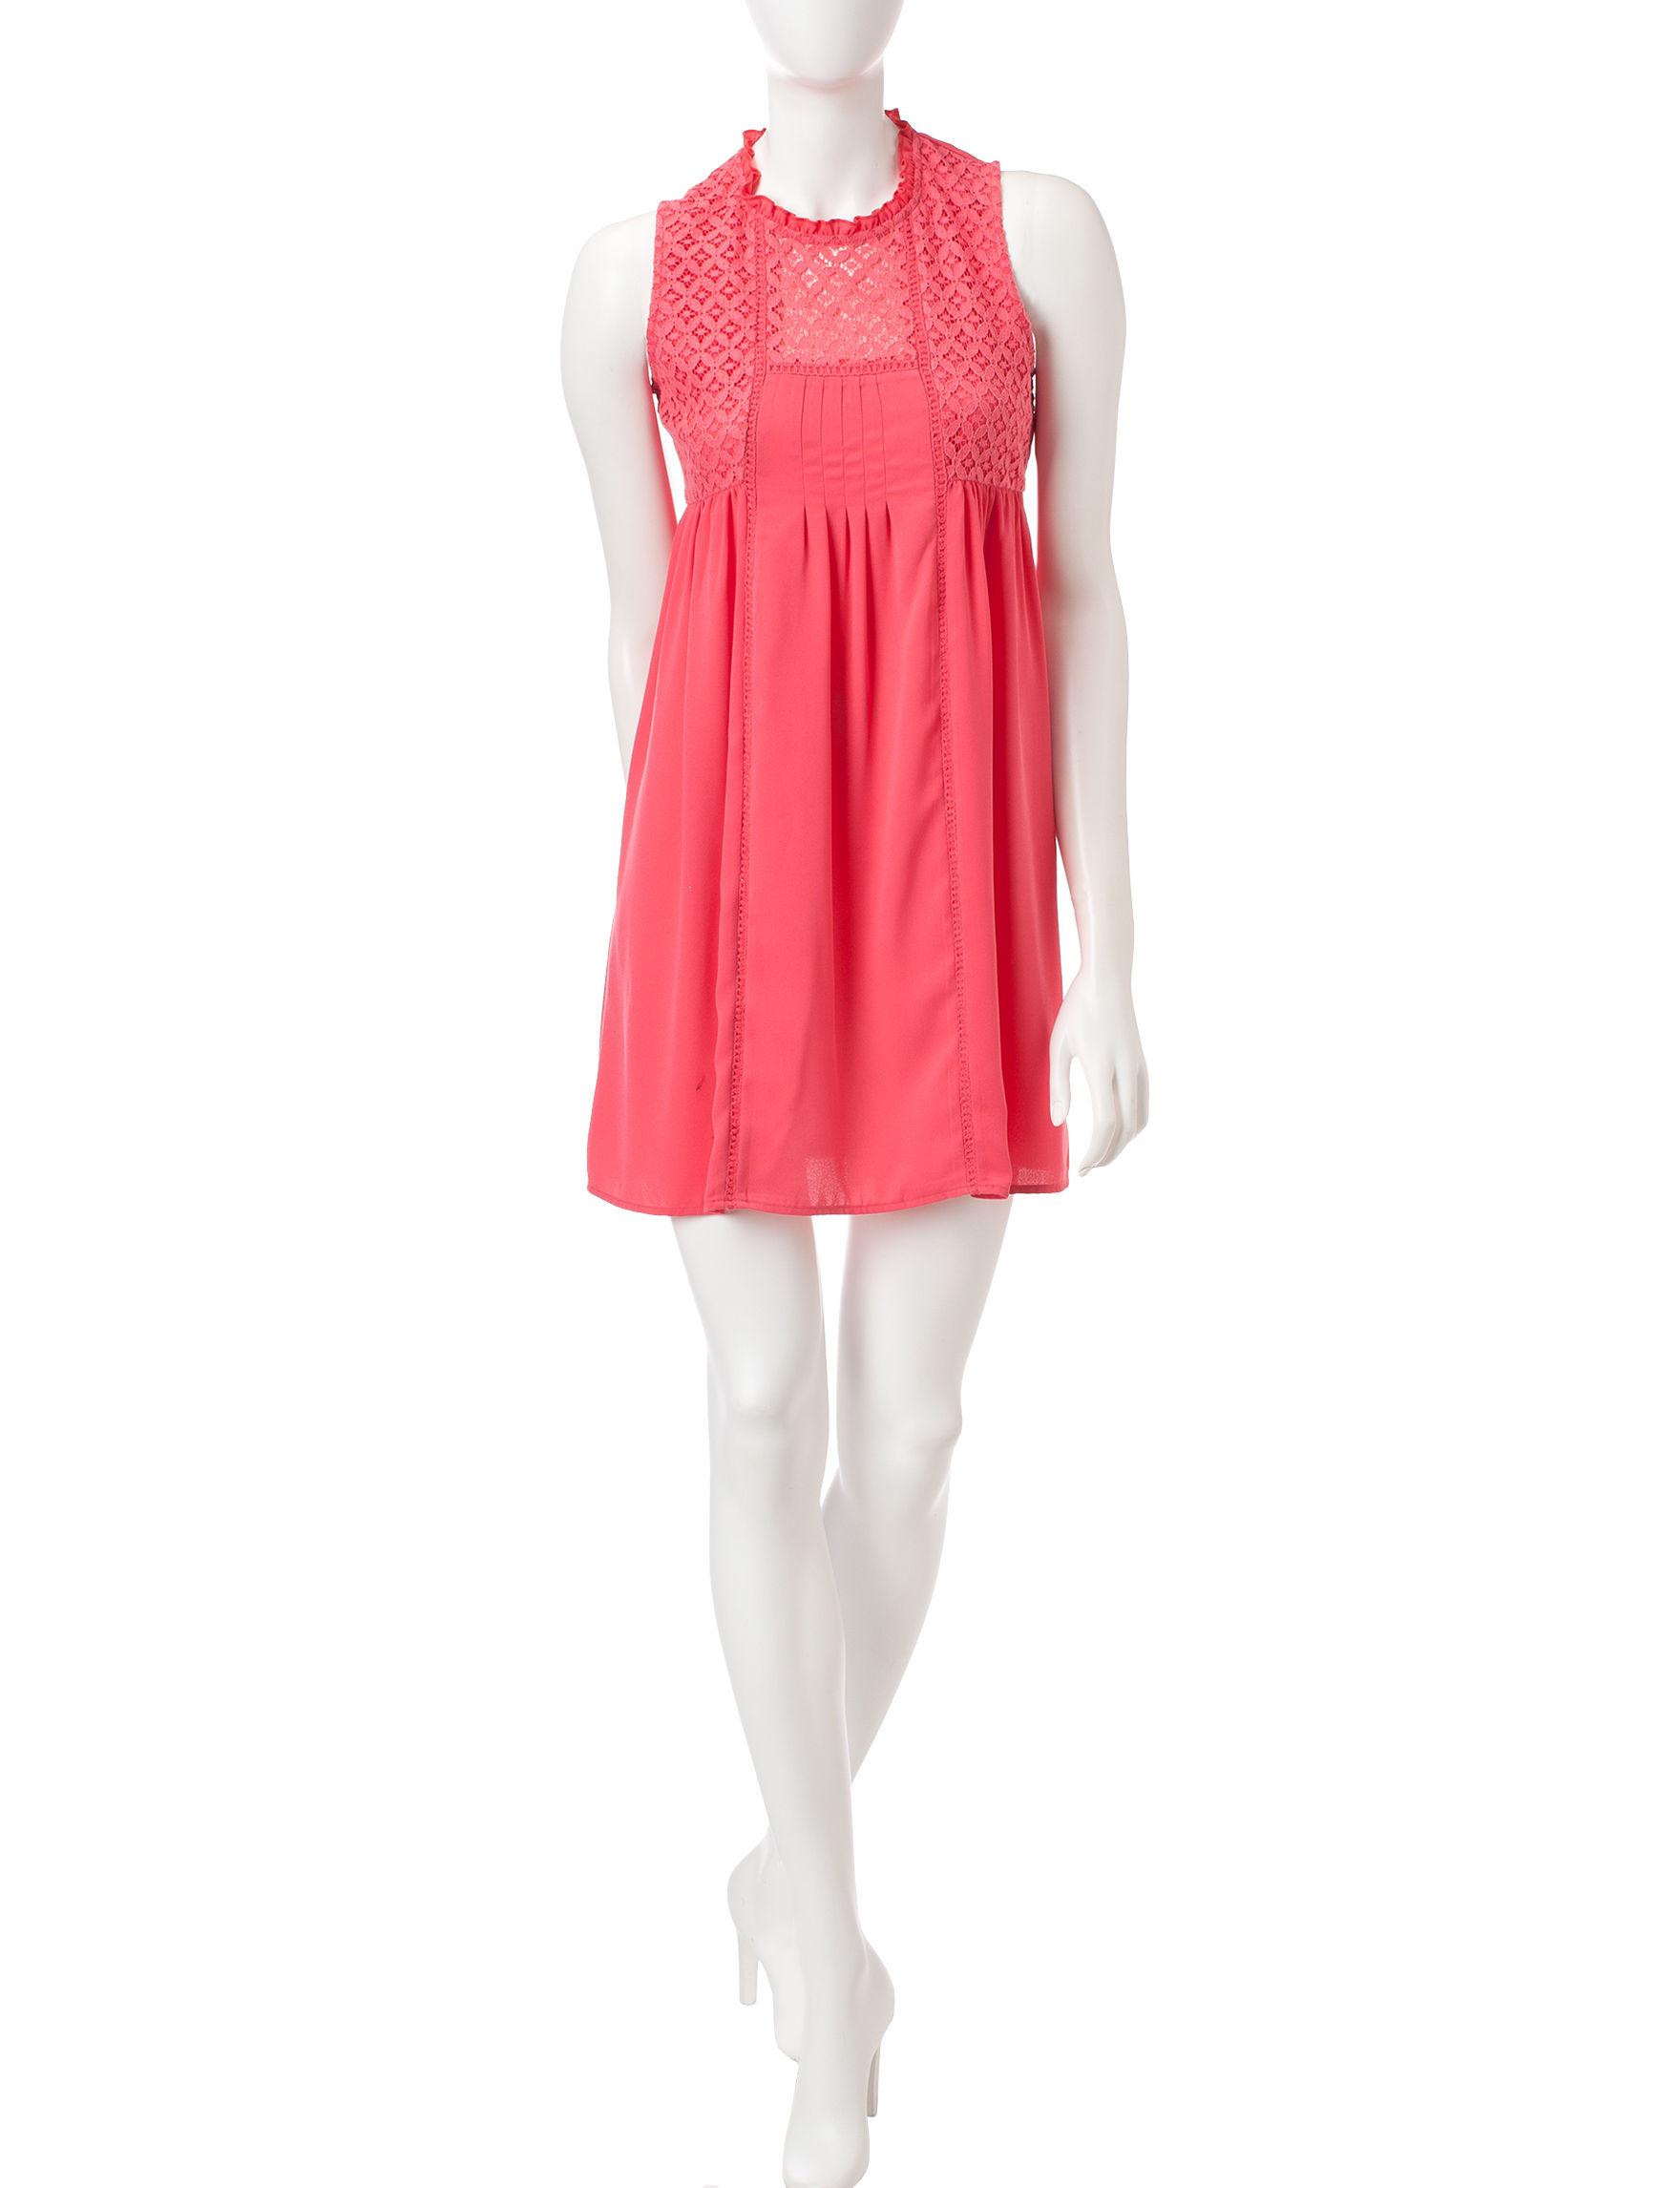 Signature Studio Coral Everyday & Casual Shift Dresses